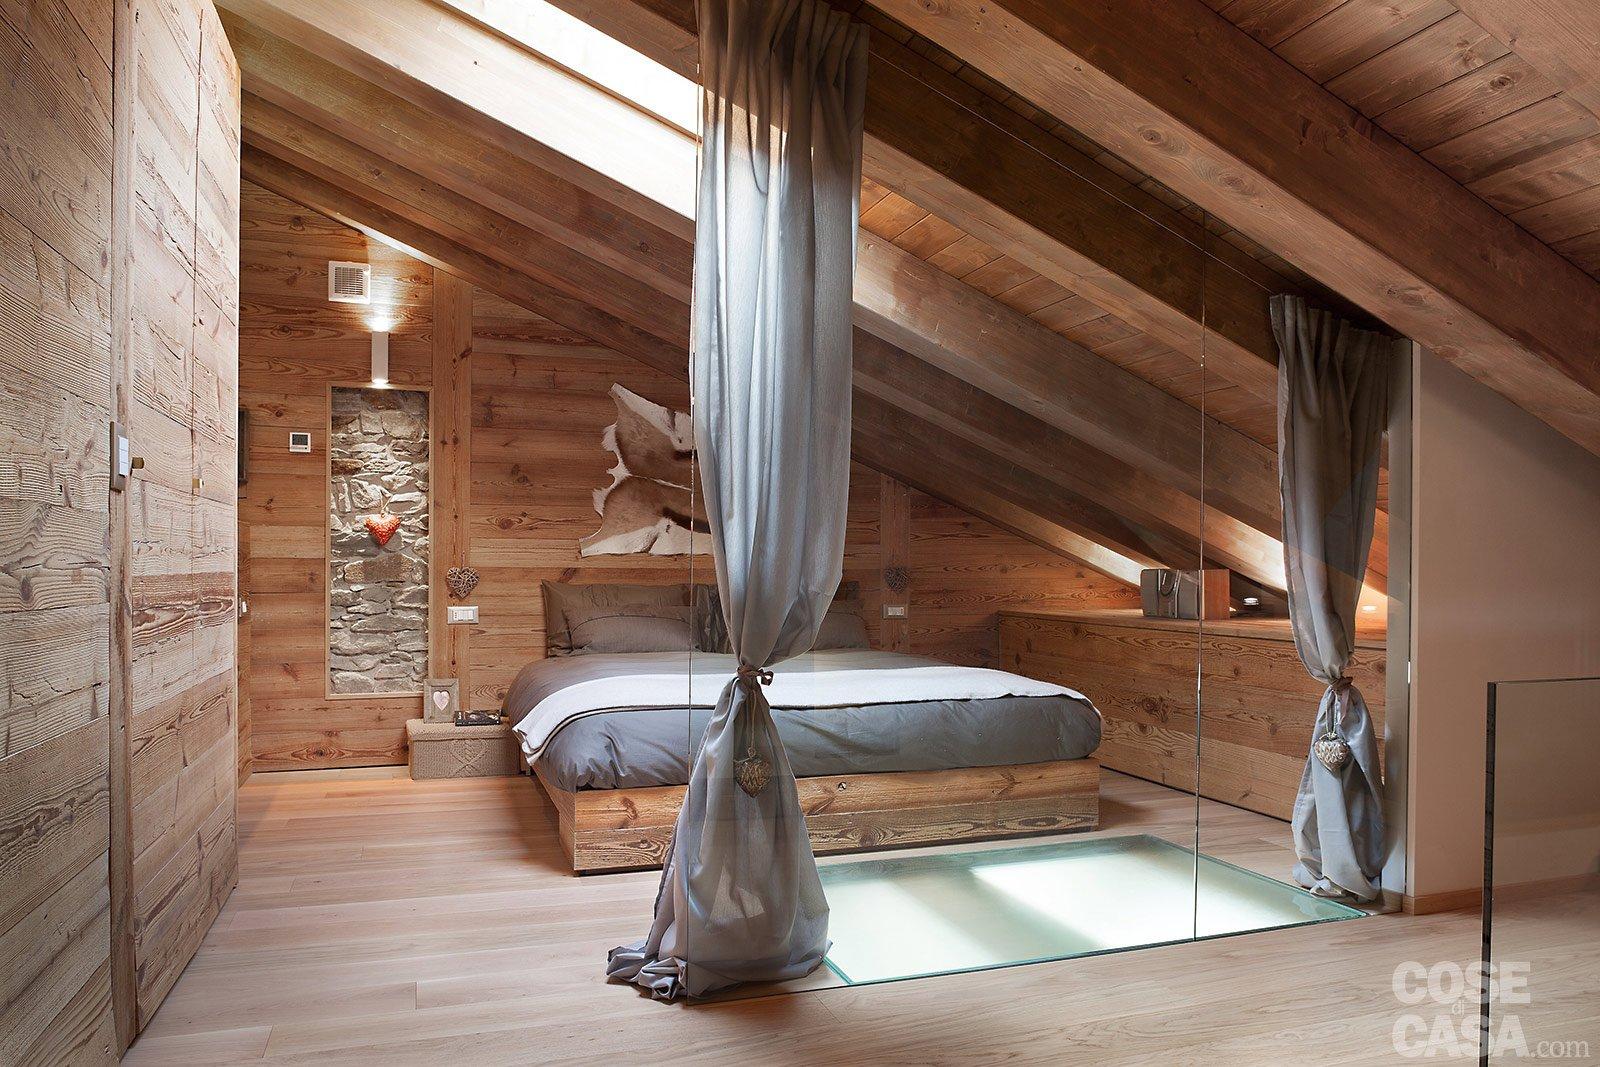 Amato Atmosfera da chalet in una casa moderna - Cose di Casa YA45